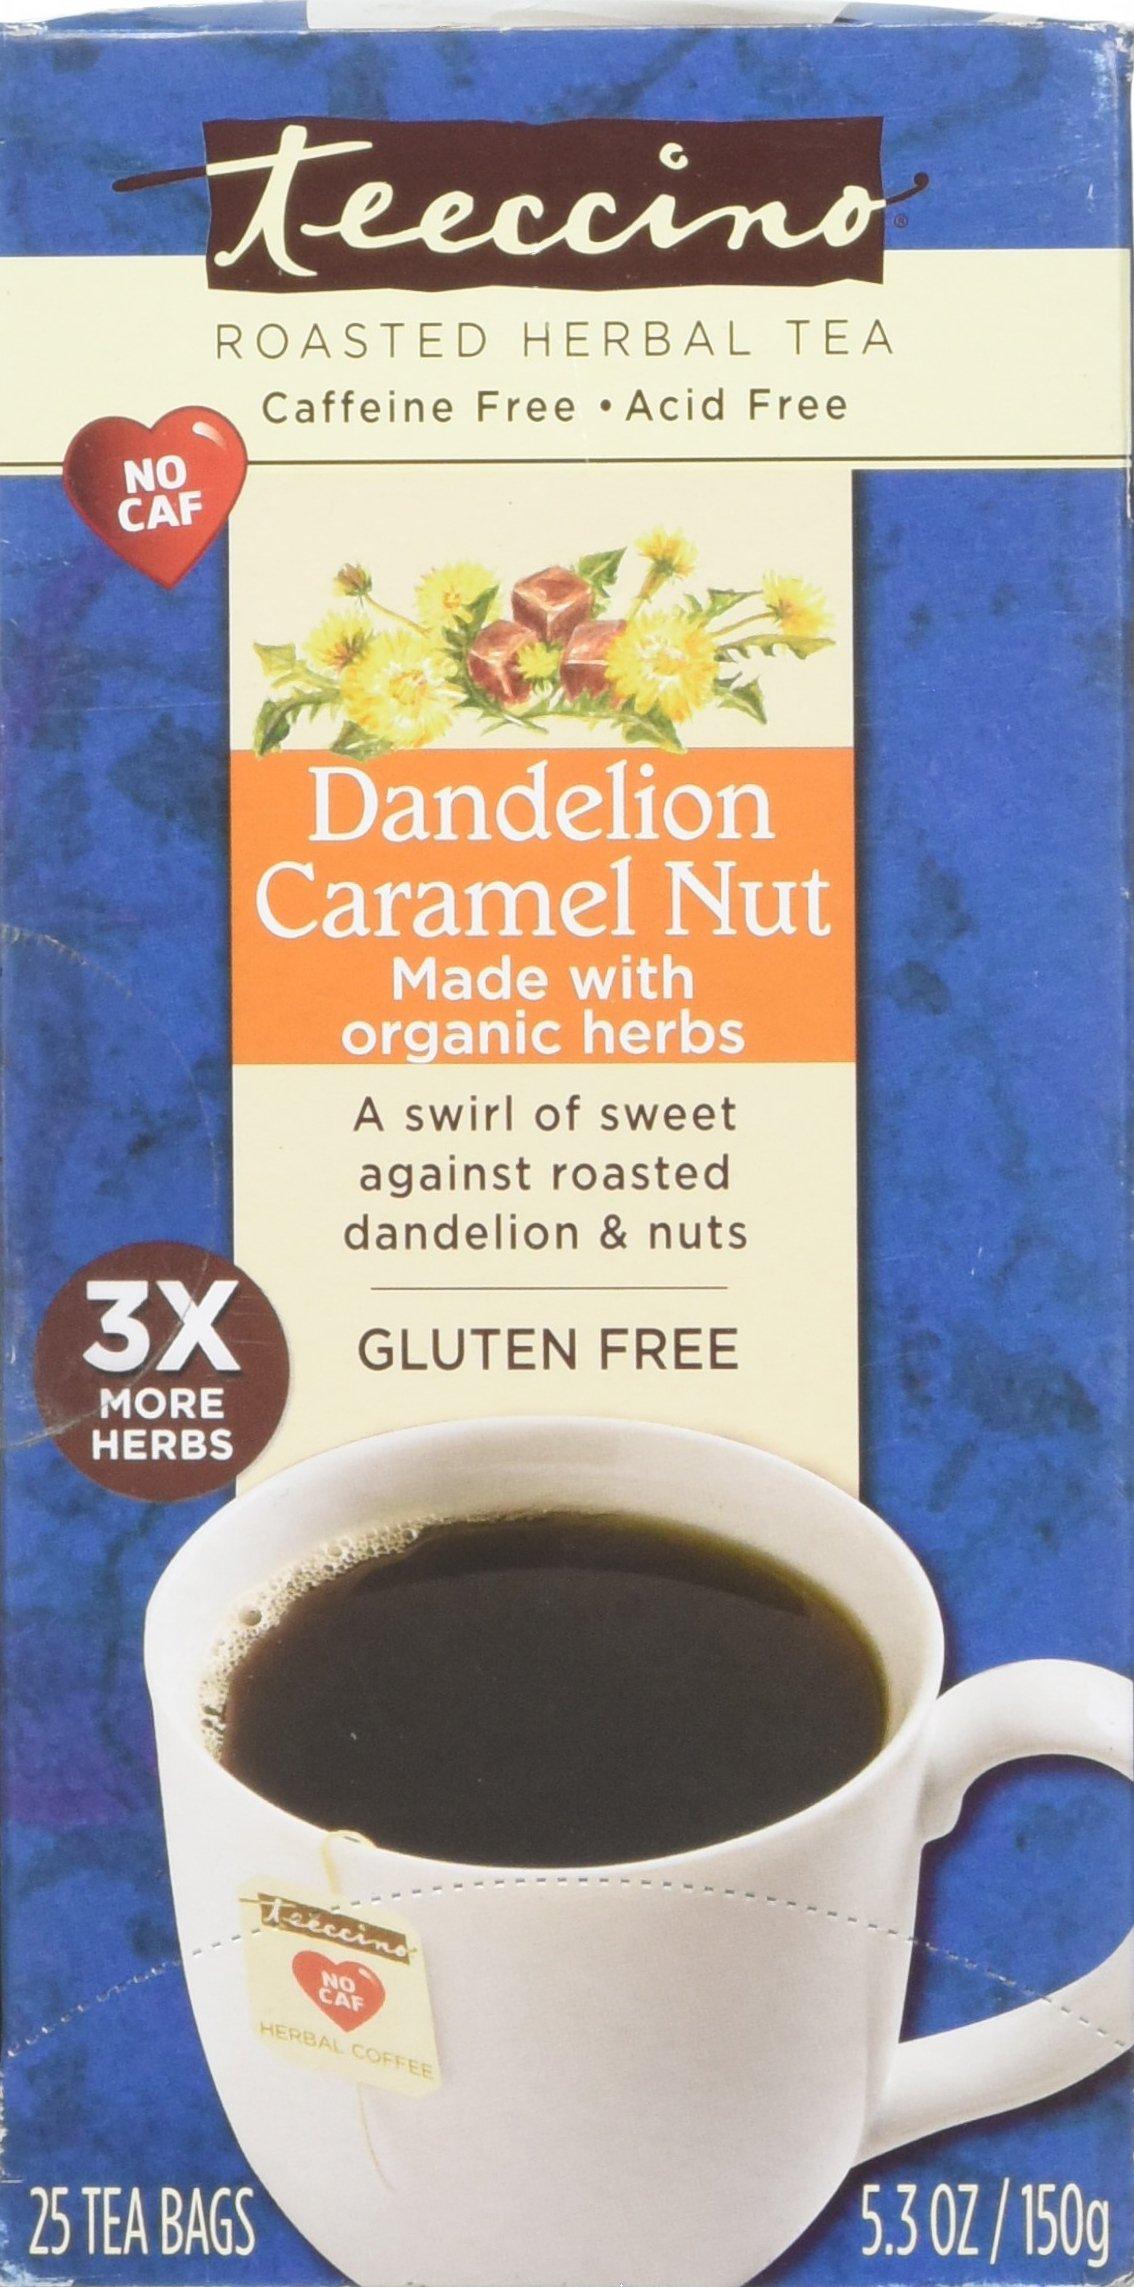 recipe: caffeine in tea bag vs coffee [22]